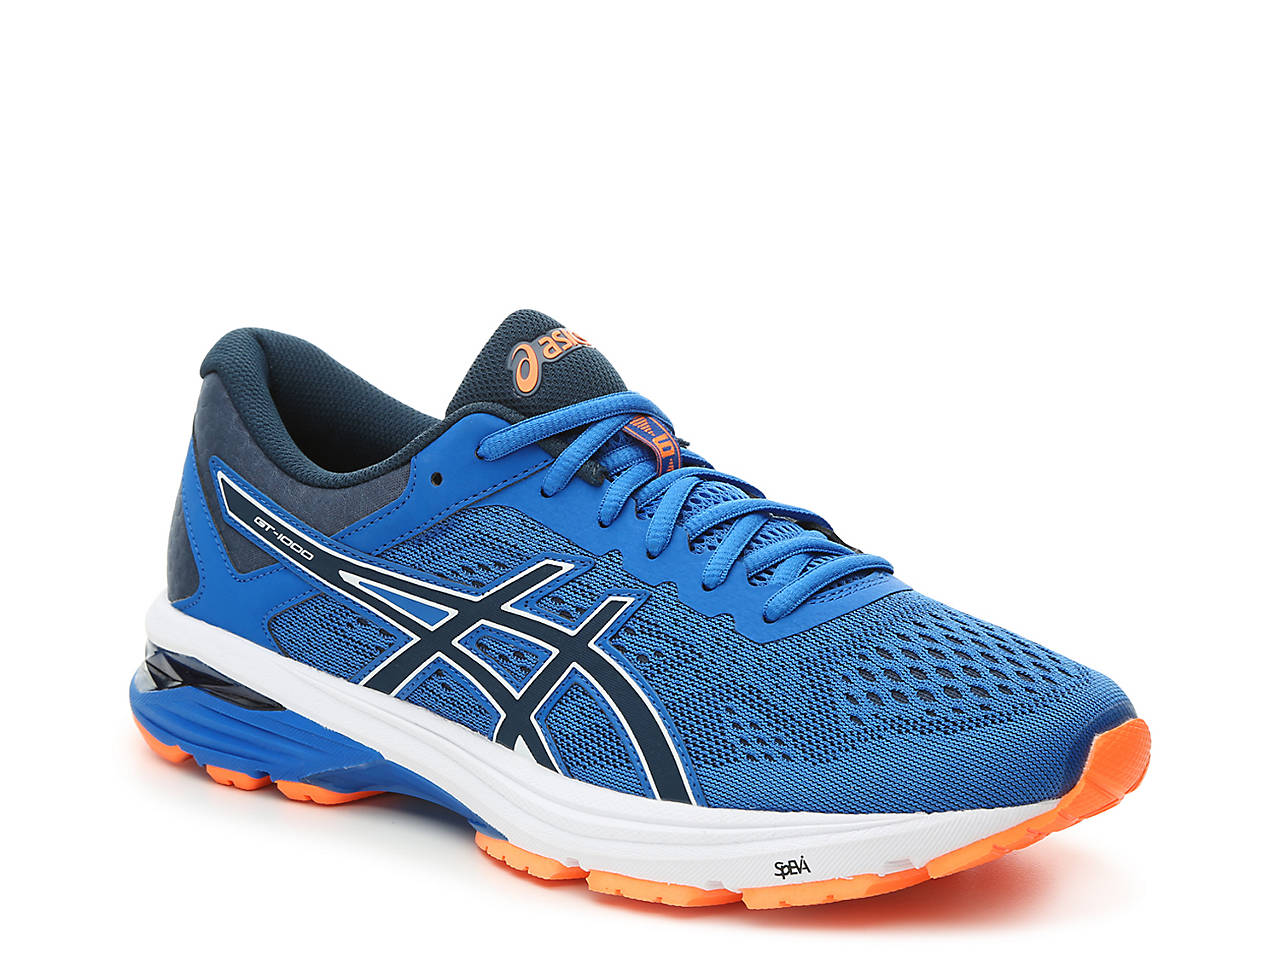 ca46e33b9221 ASICS GT-1000 6 Performance Running Shoe - Men s Men s Shoes